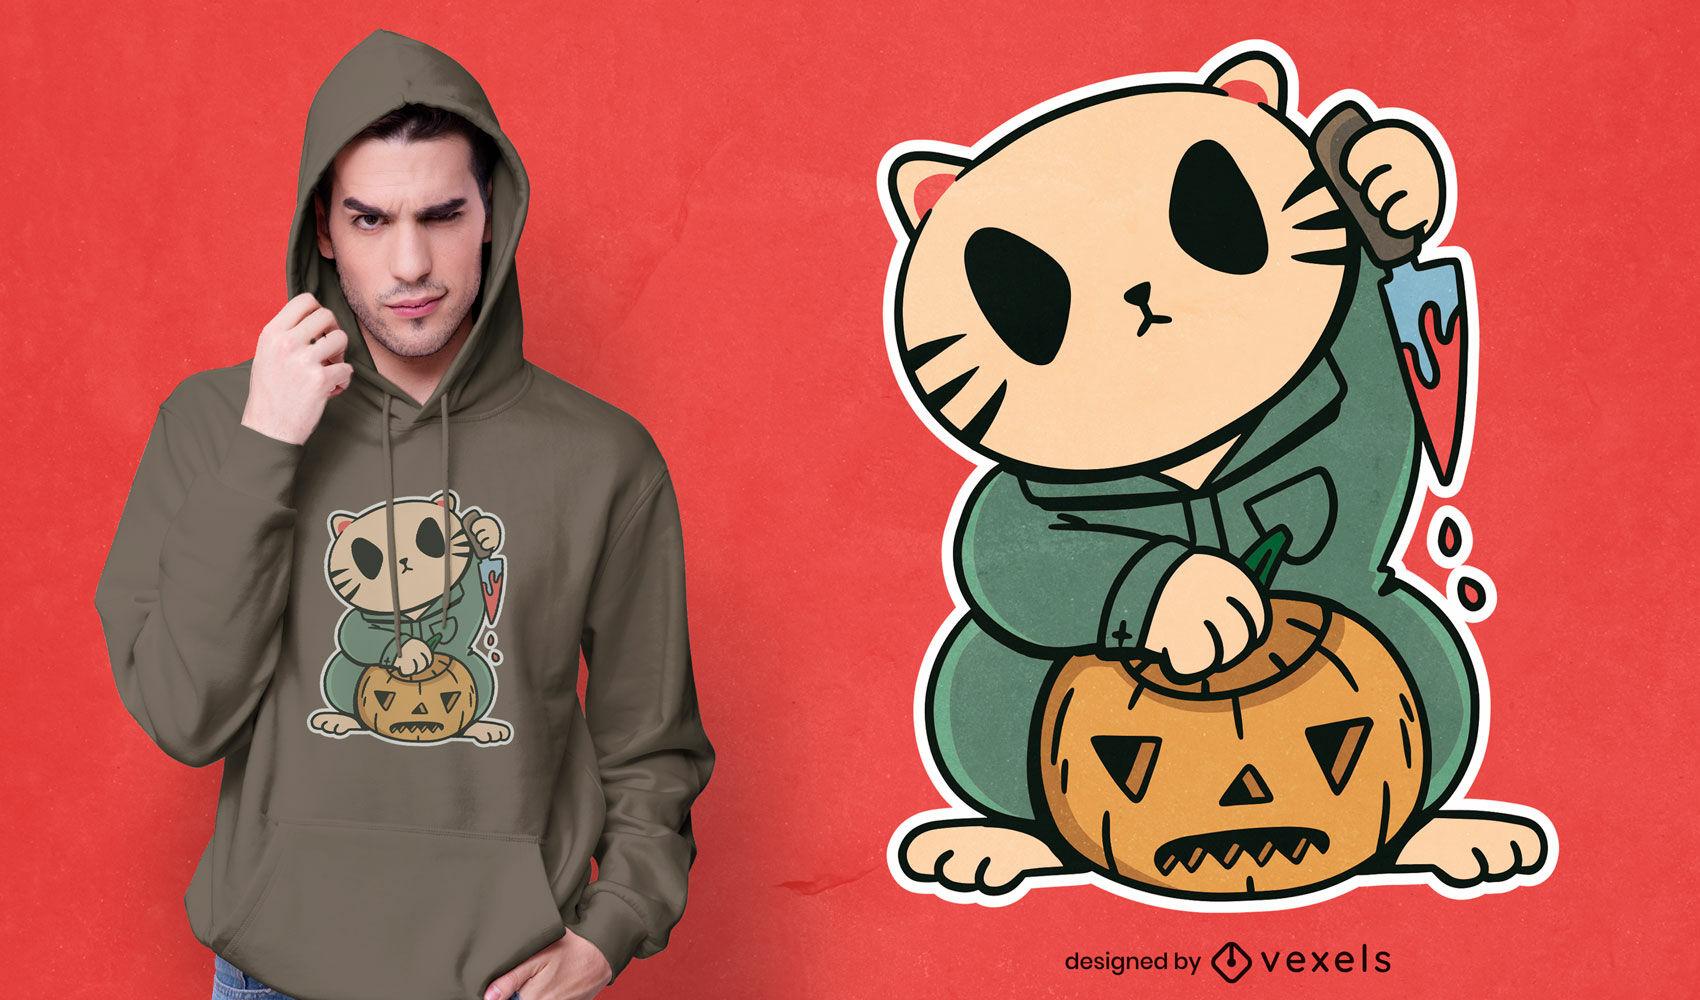 Dise?o de camiseta de personaje de gato de halloween